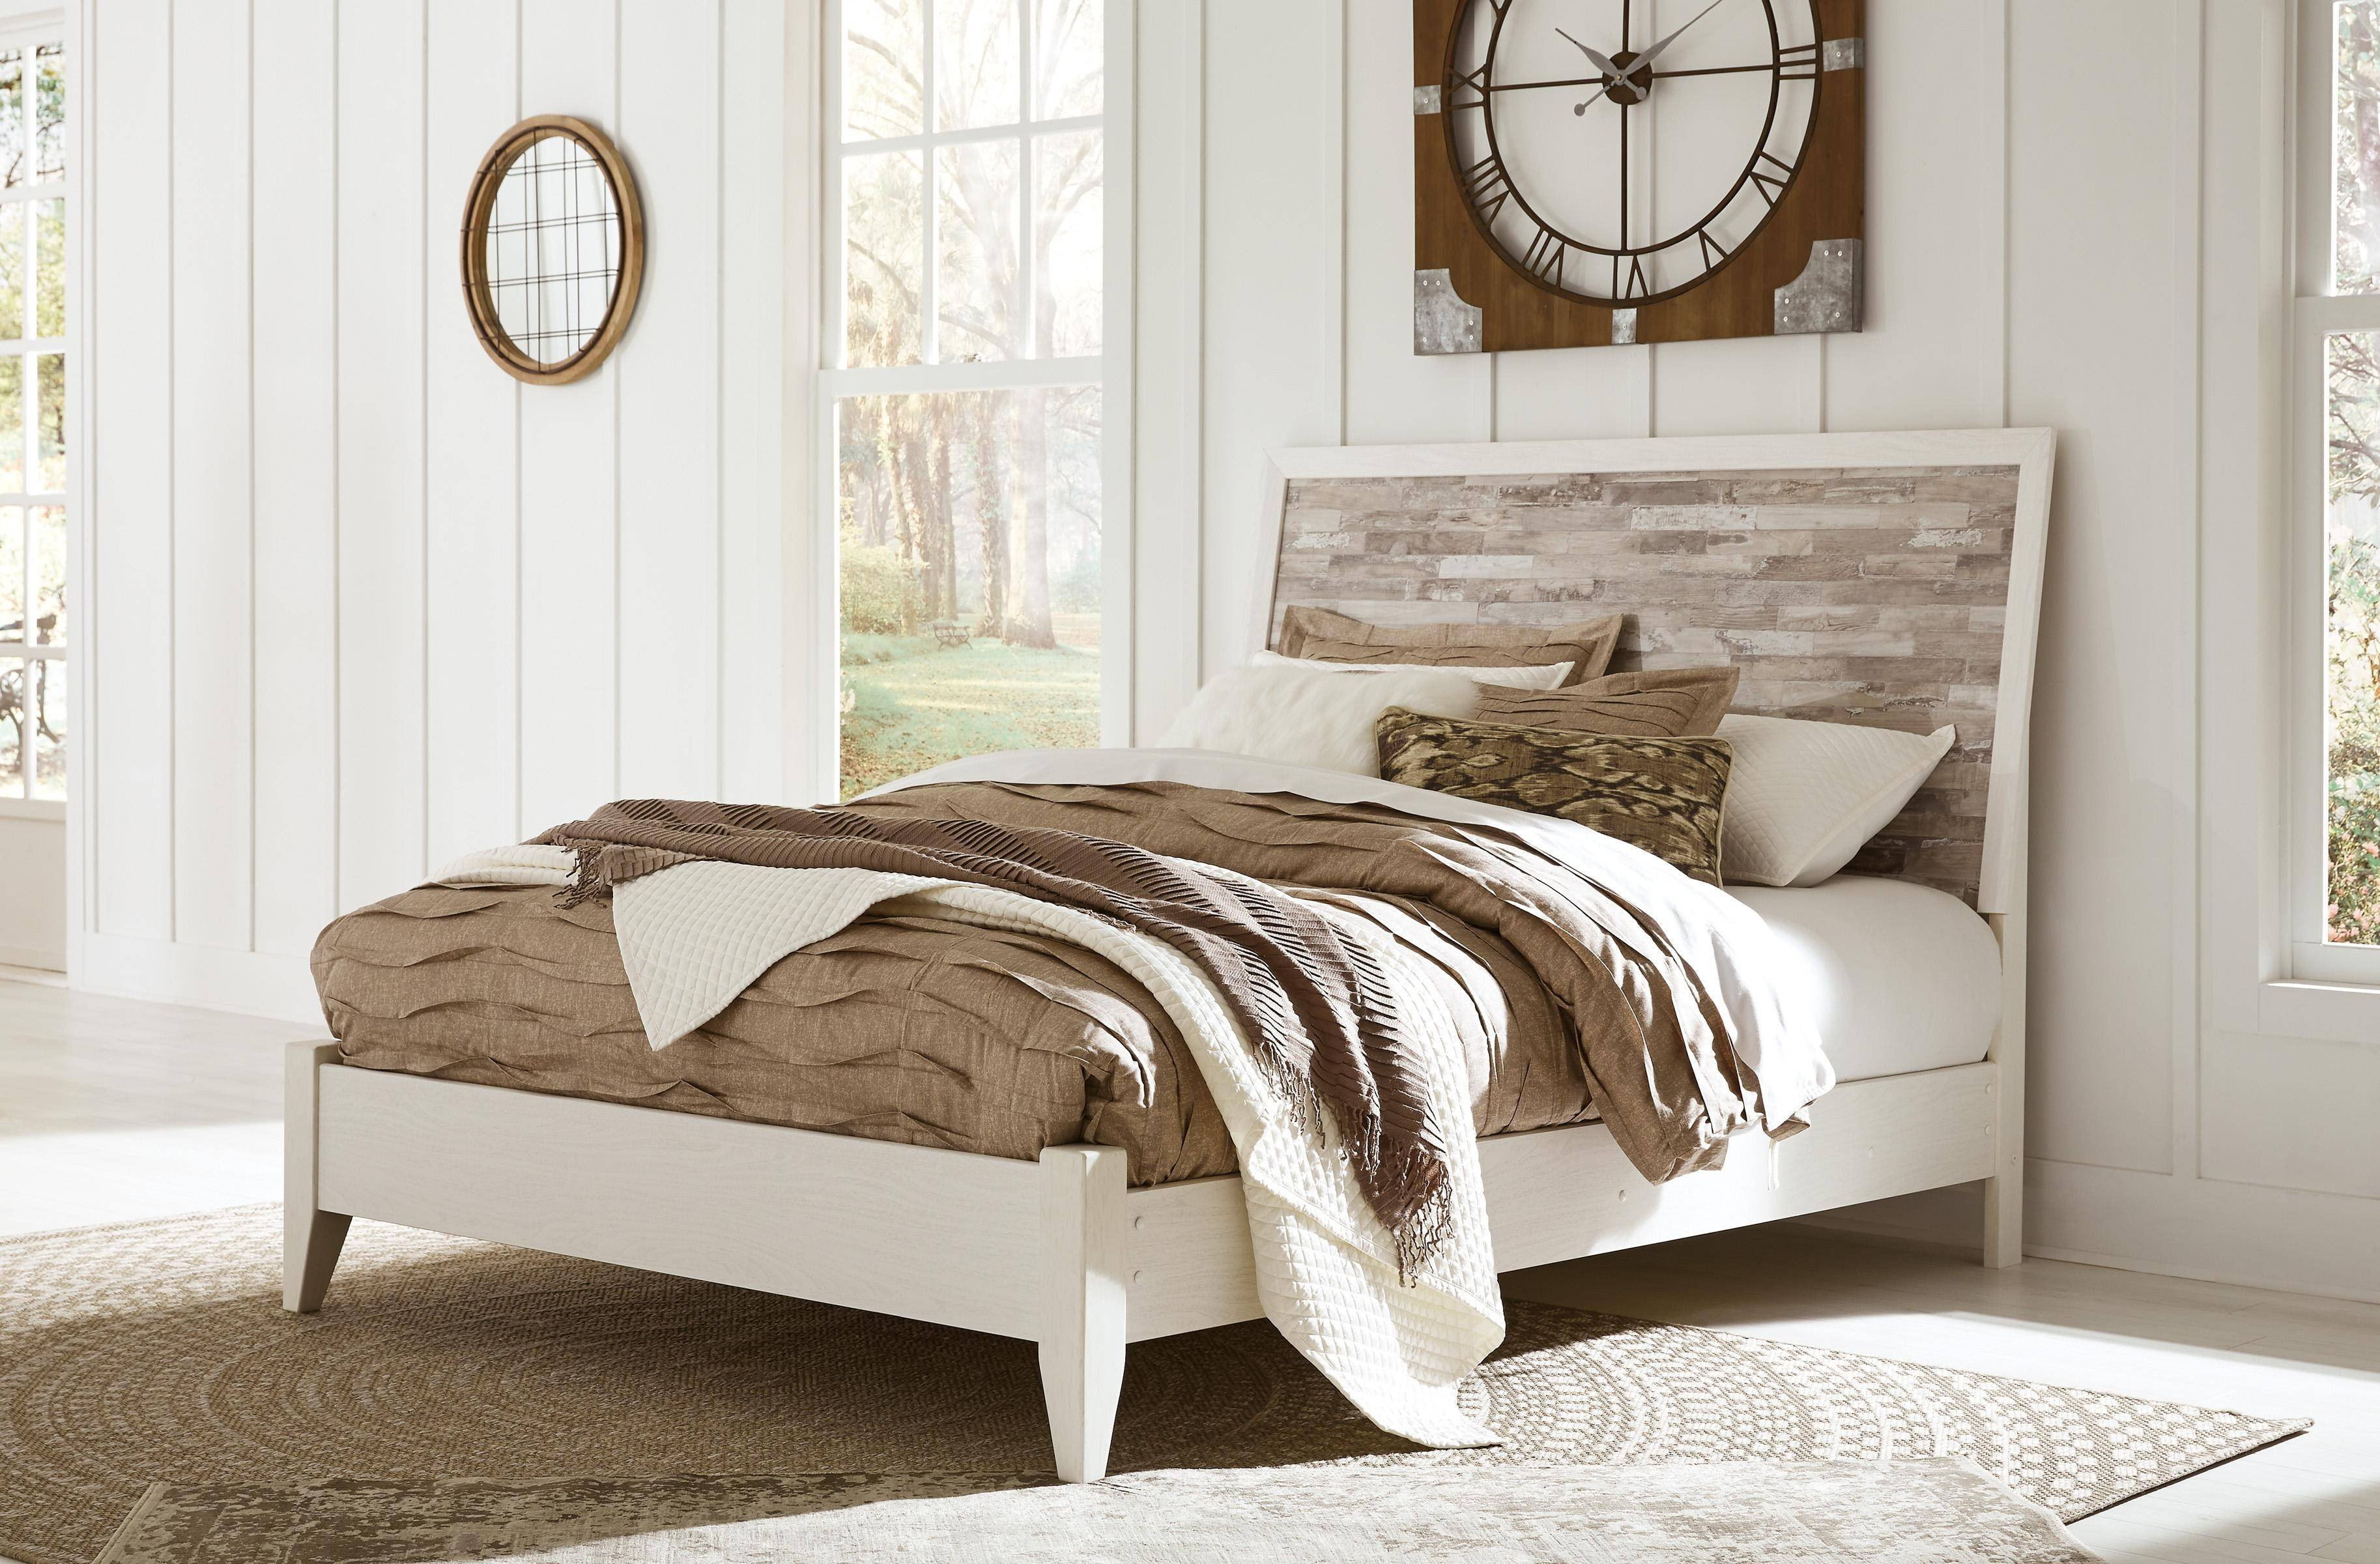 Ashley Furniture Queen Size Bedroom Set Luxury ashley Evanni B315 Queen Size Platform Bedroom Set 6pcs In